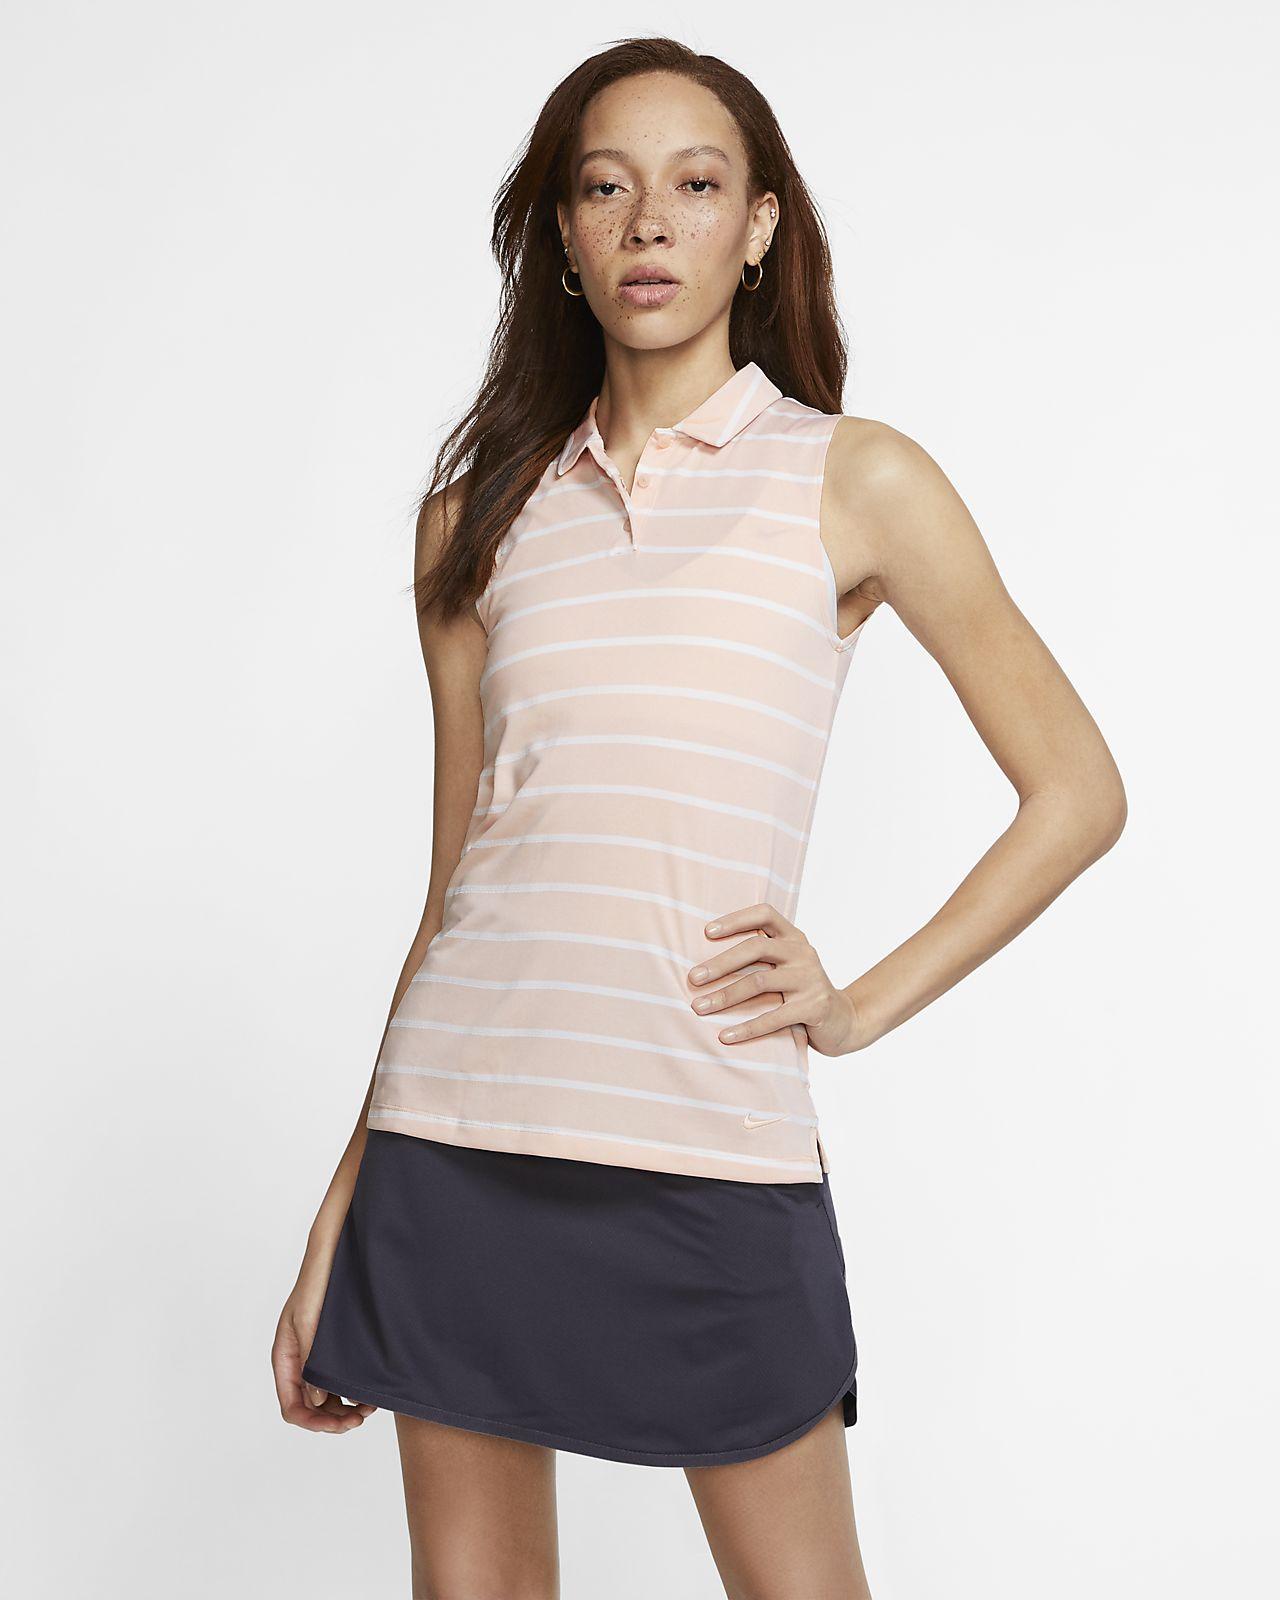 Nike Dri-FIT Women's Sleeveless Striped Golf Polo